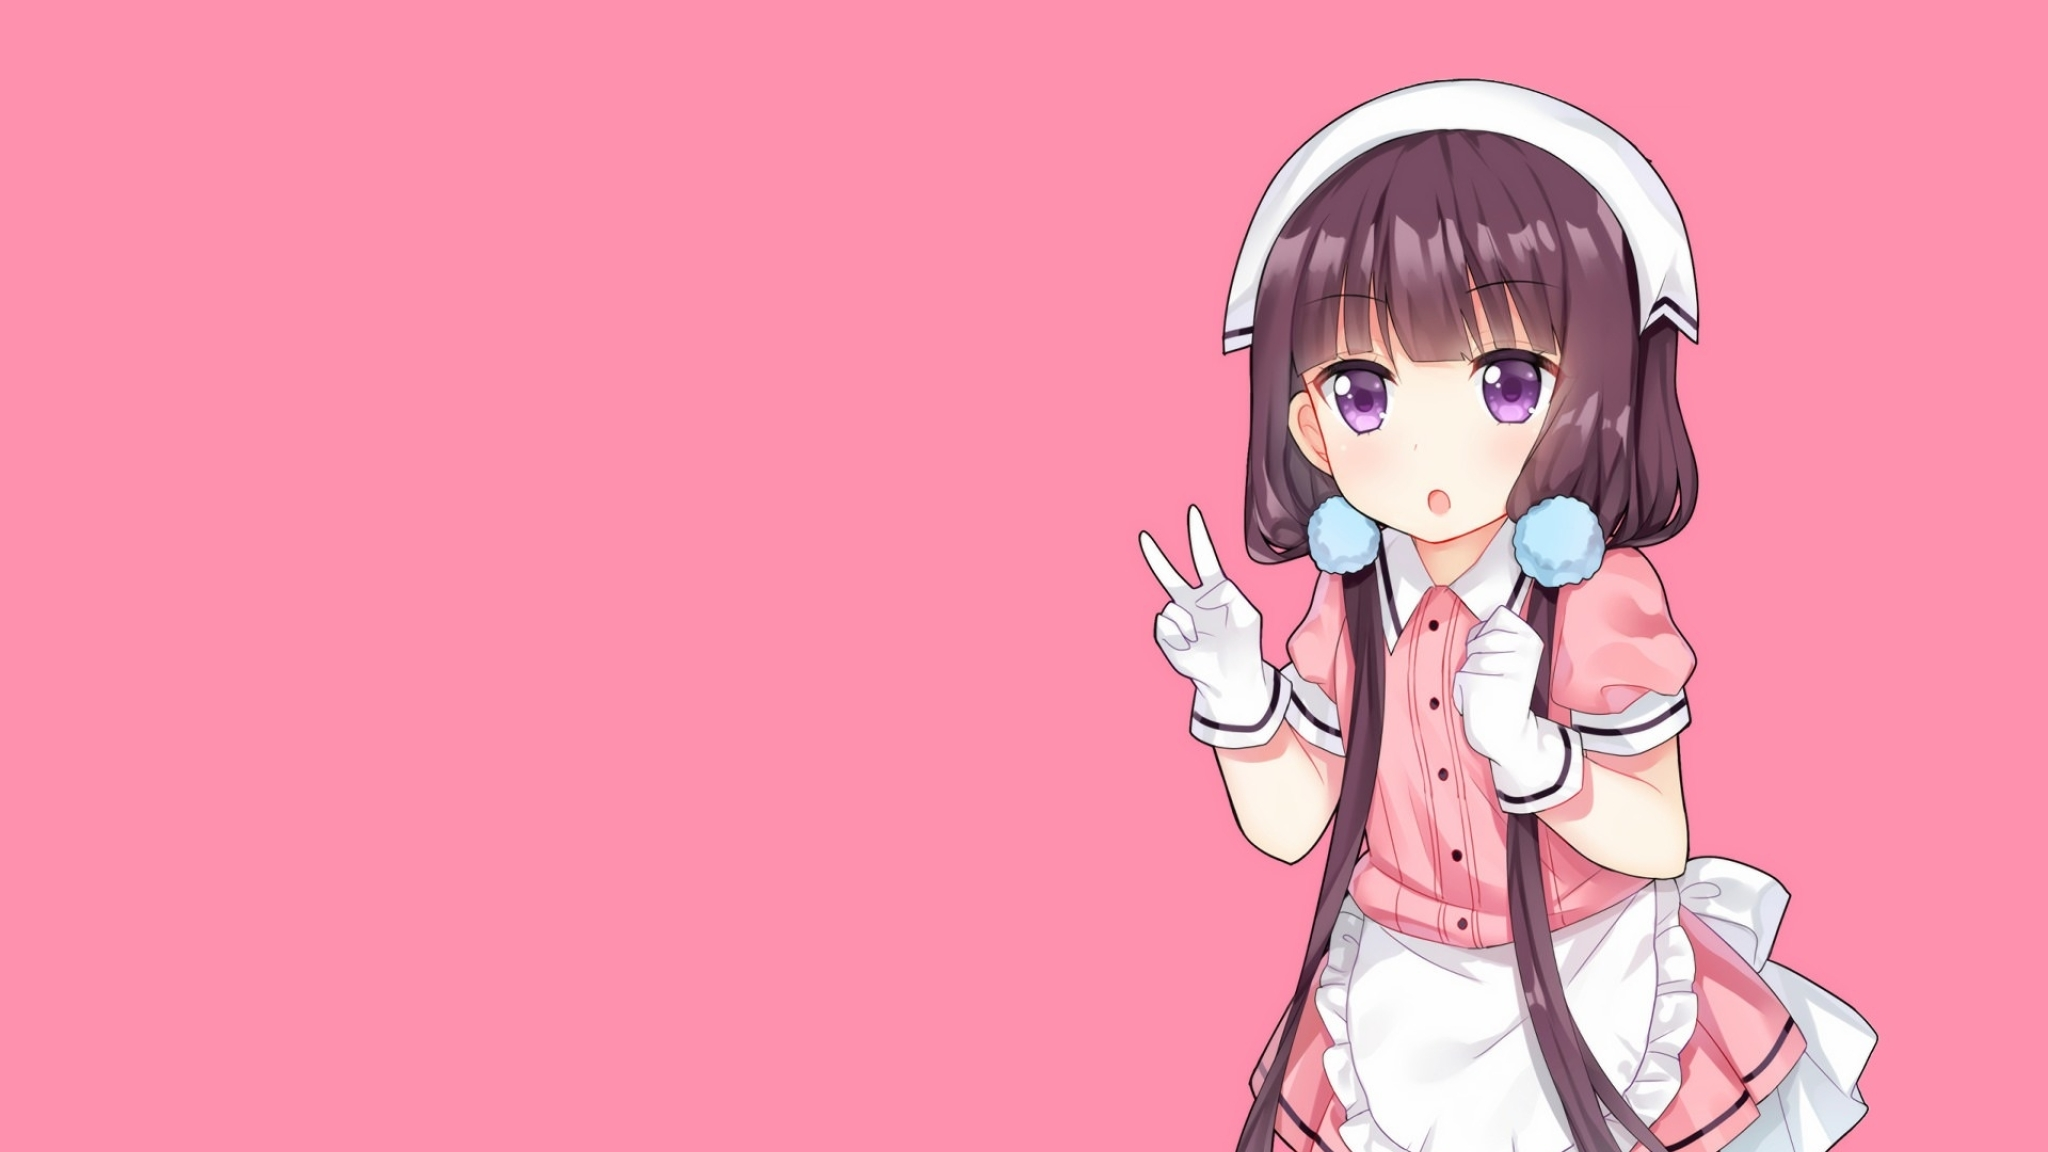 2048x1152 Blend S Anime 2048x1152 Resolution Wallpaper Hd